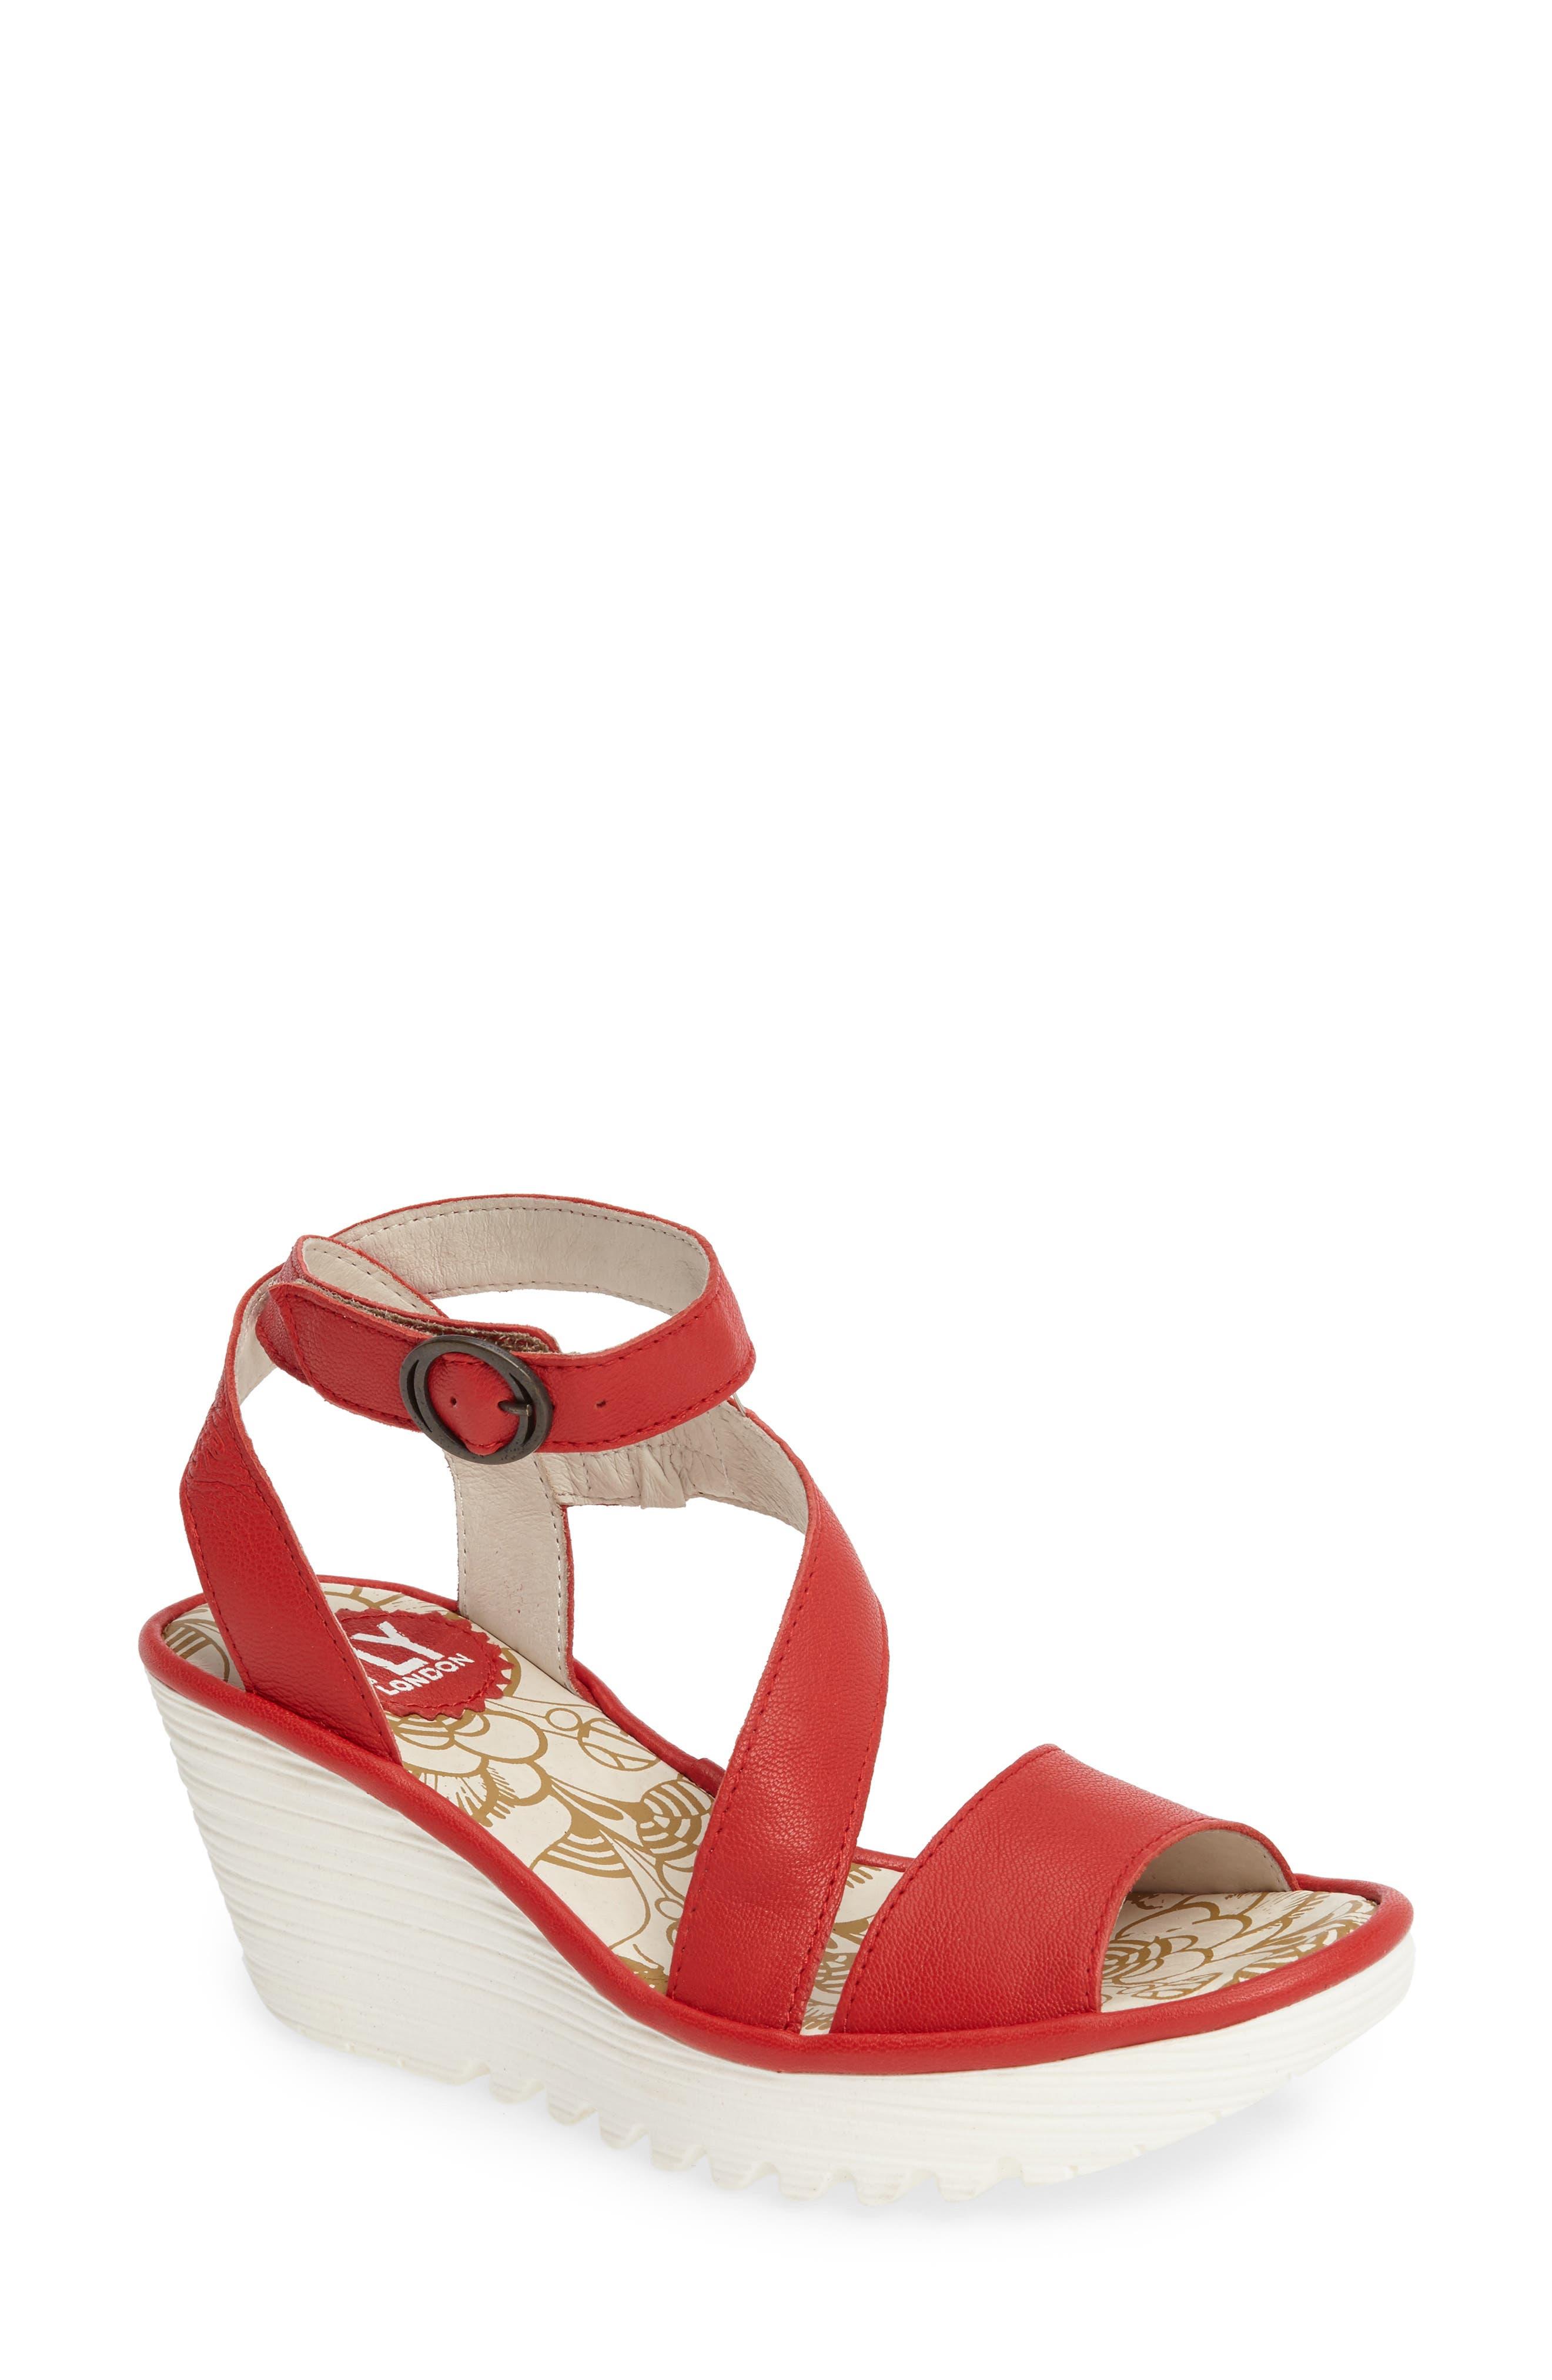 Fly London 'Yesk' Ankle Strap Wedge Sandal (Women)